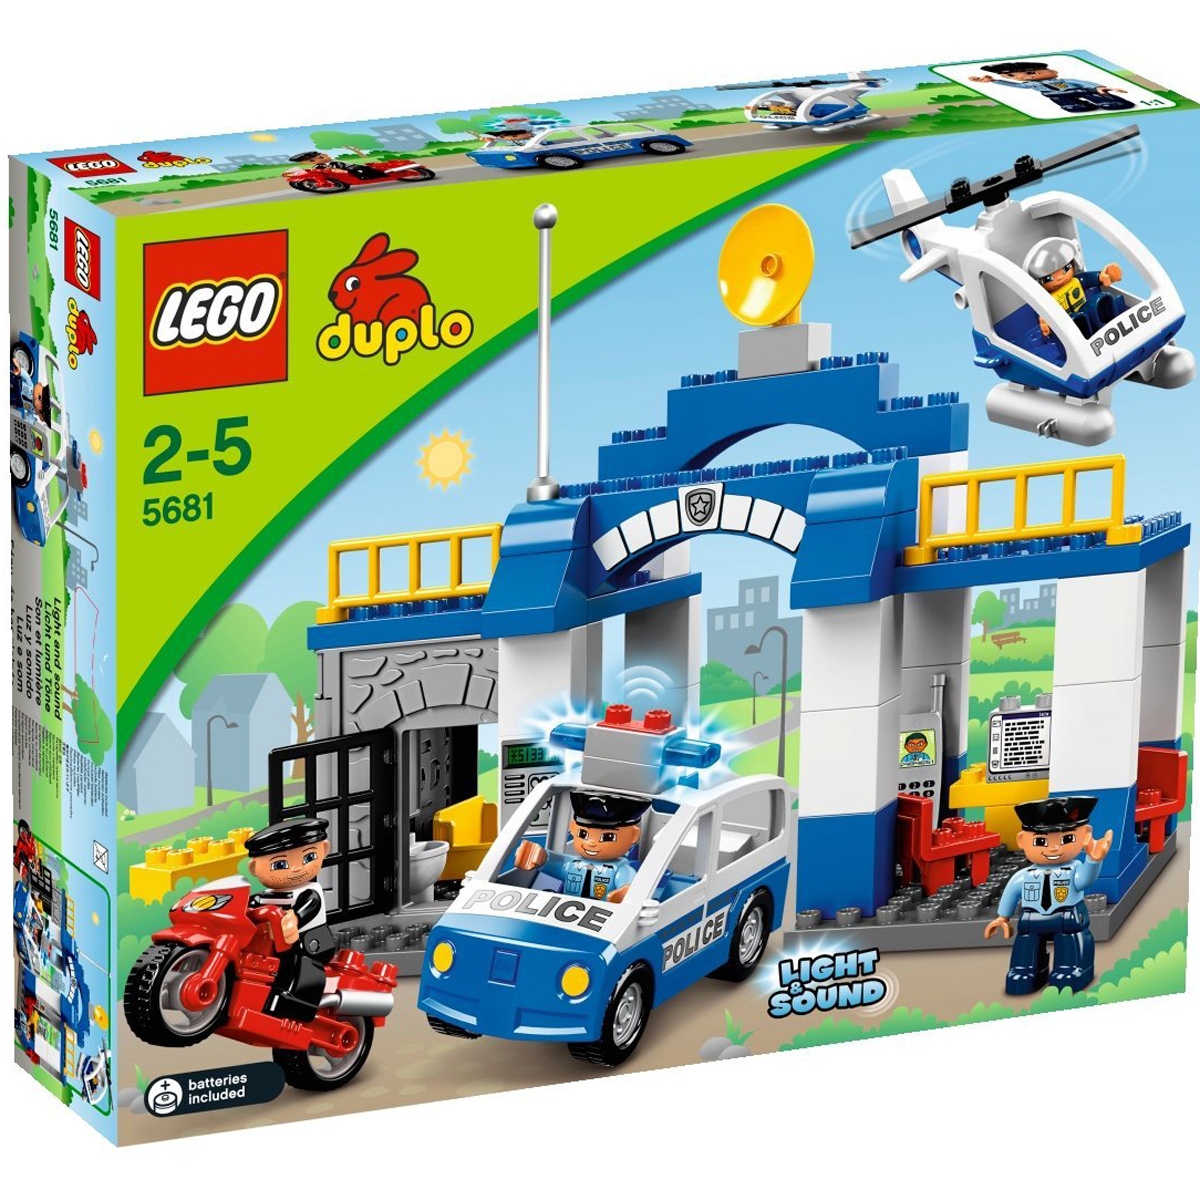 Do choi xep hinh Lego Duplo 5681- So canh sat